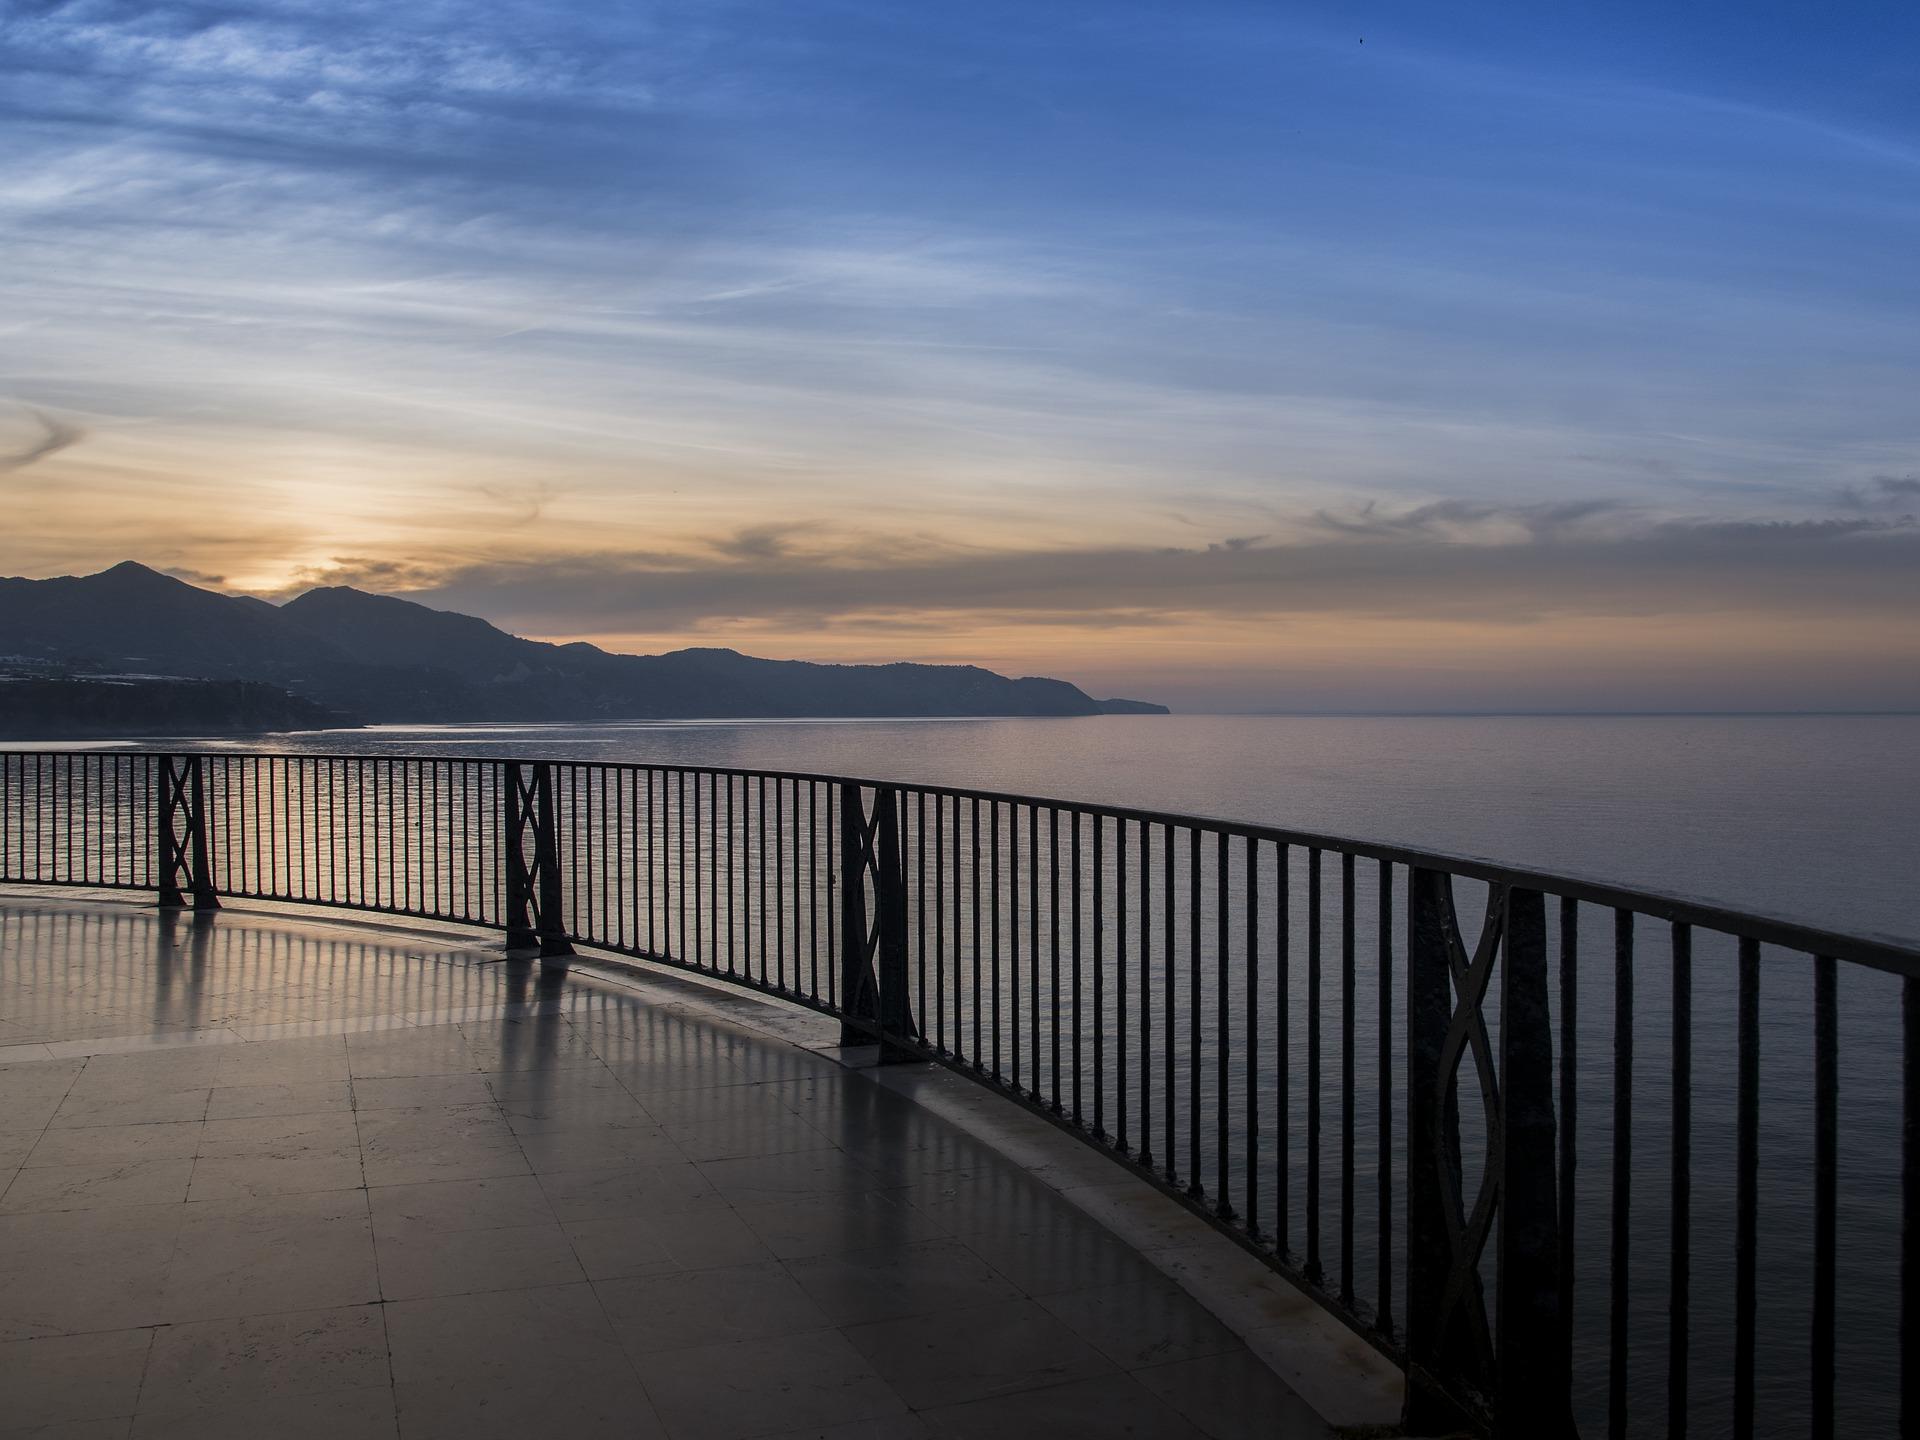 playa malaga nerja mejores destinos verano